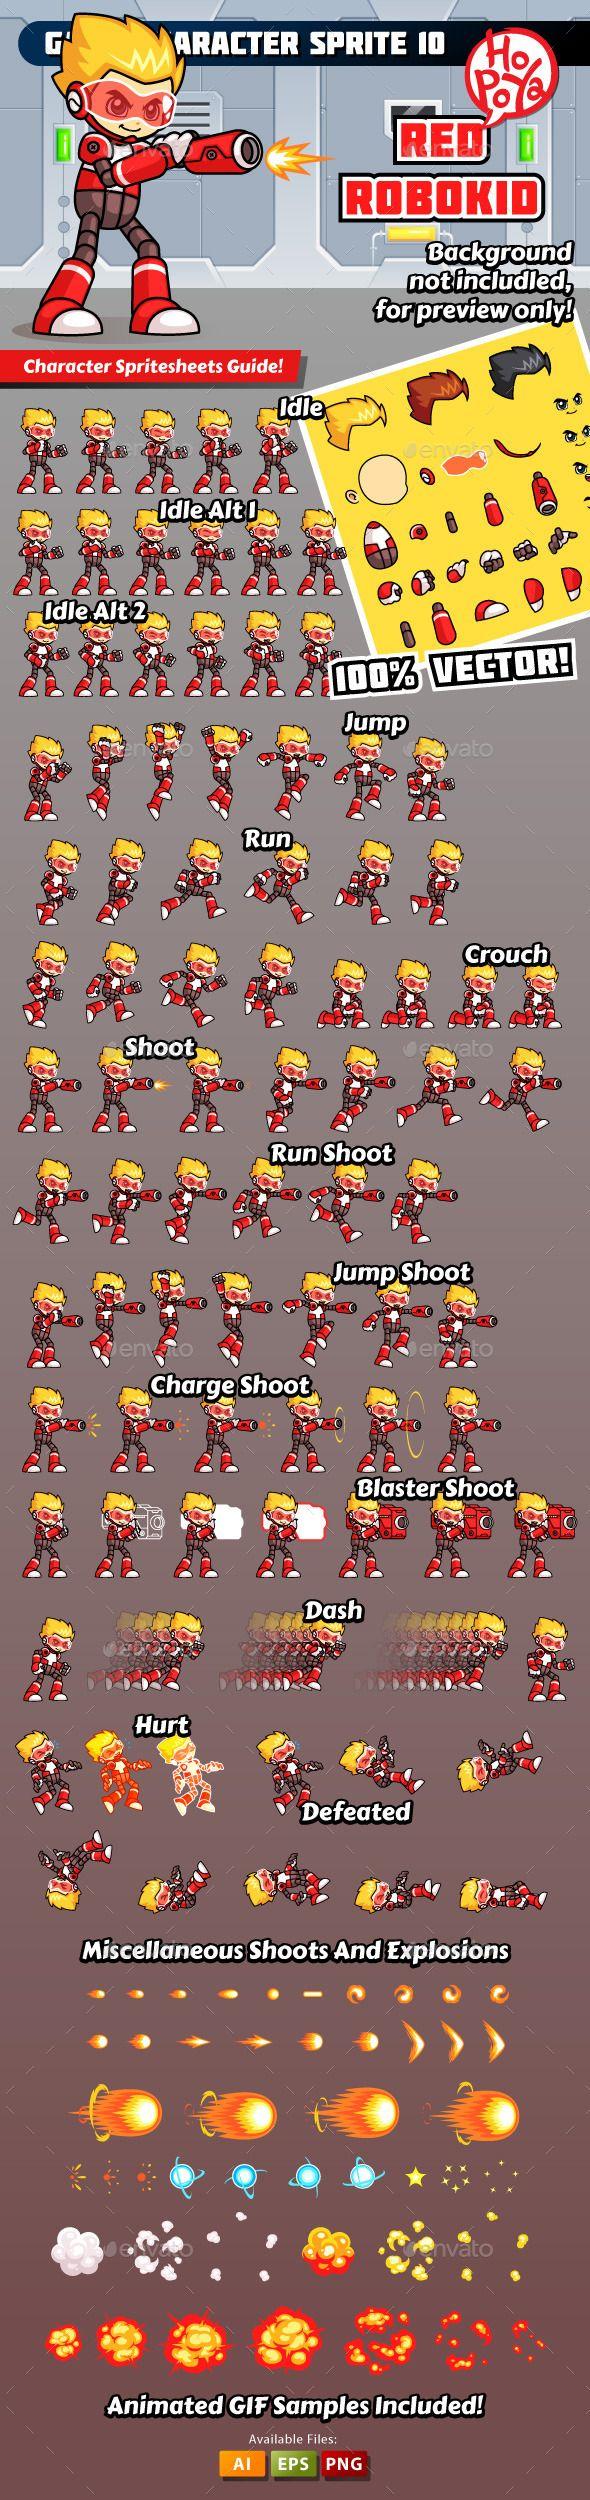 Game Character Sprite 10 Download here: https://graphicriver.net/item/game-character-sprite-10/10269623?ref=KlitVogli